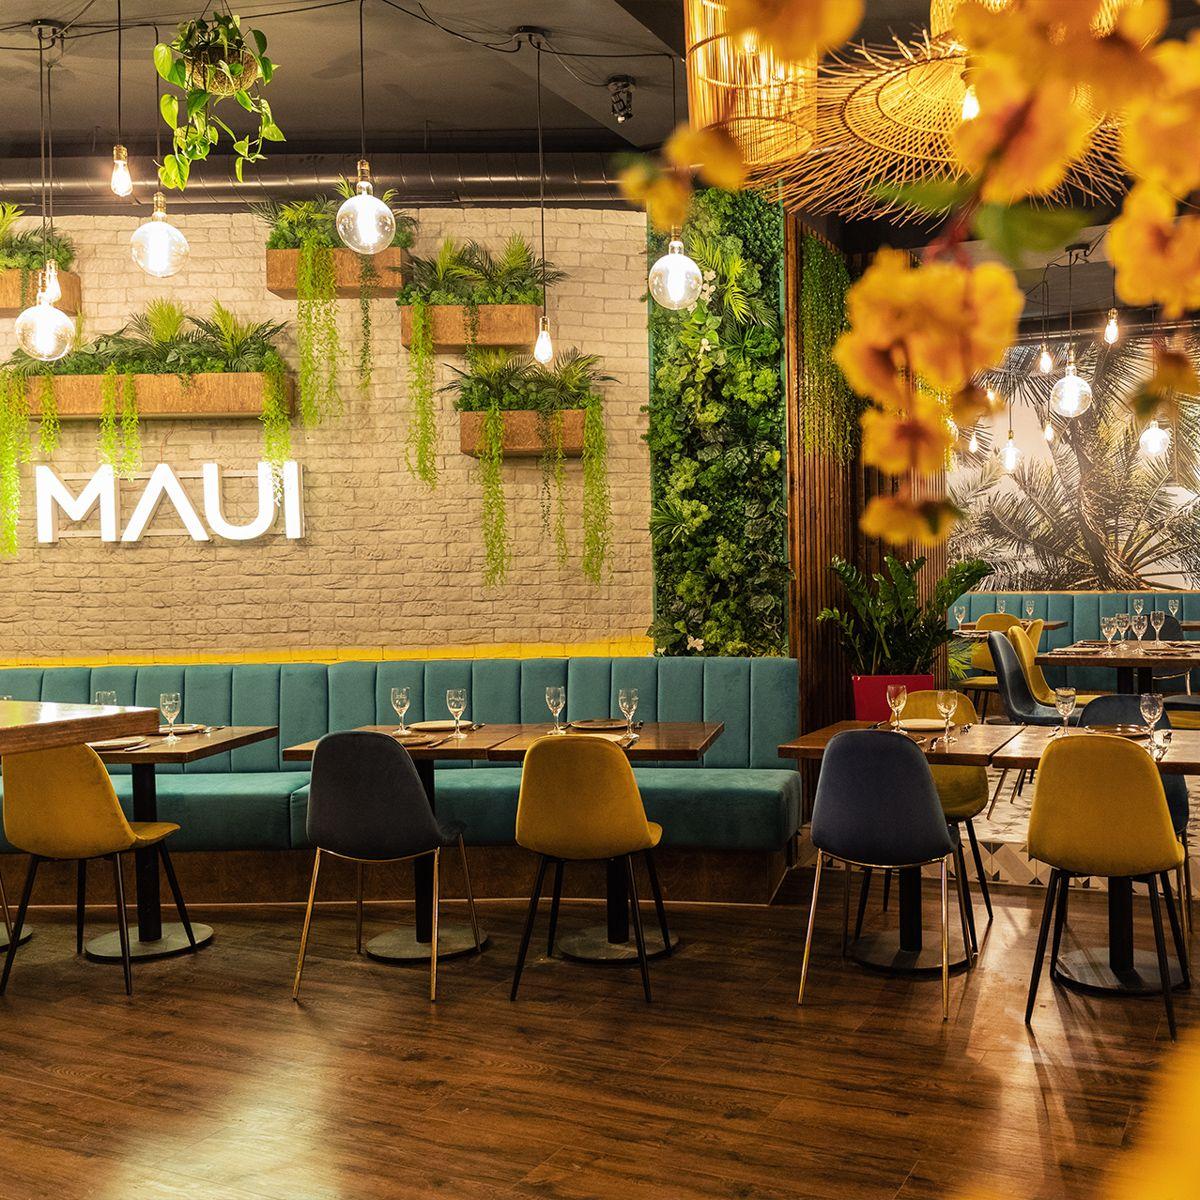 Maui Hawaiianisches Restaurant In Neuhausen Munchen Creme Guides In 2020 Restaurant Restaurant Munchen Maui